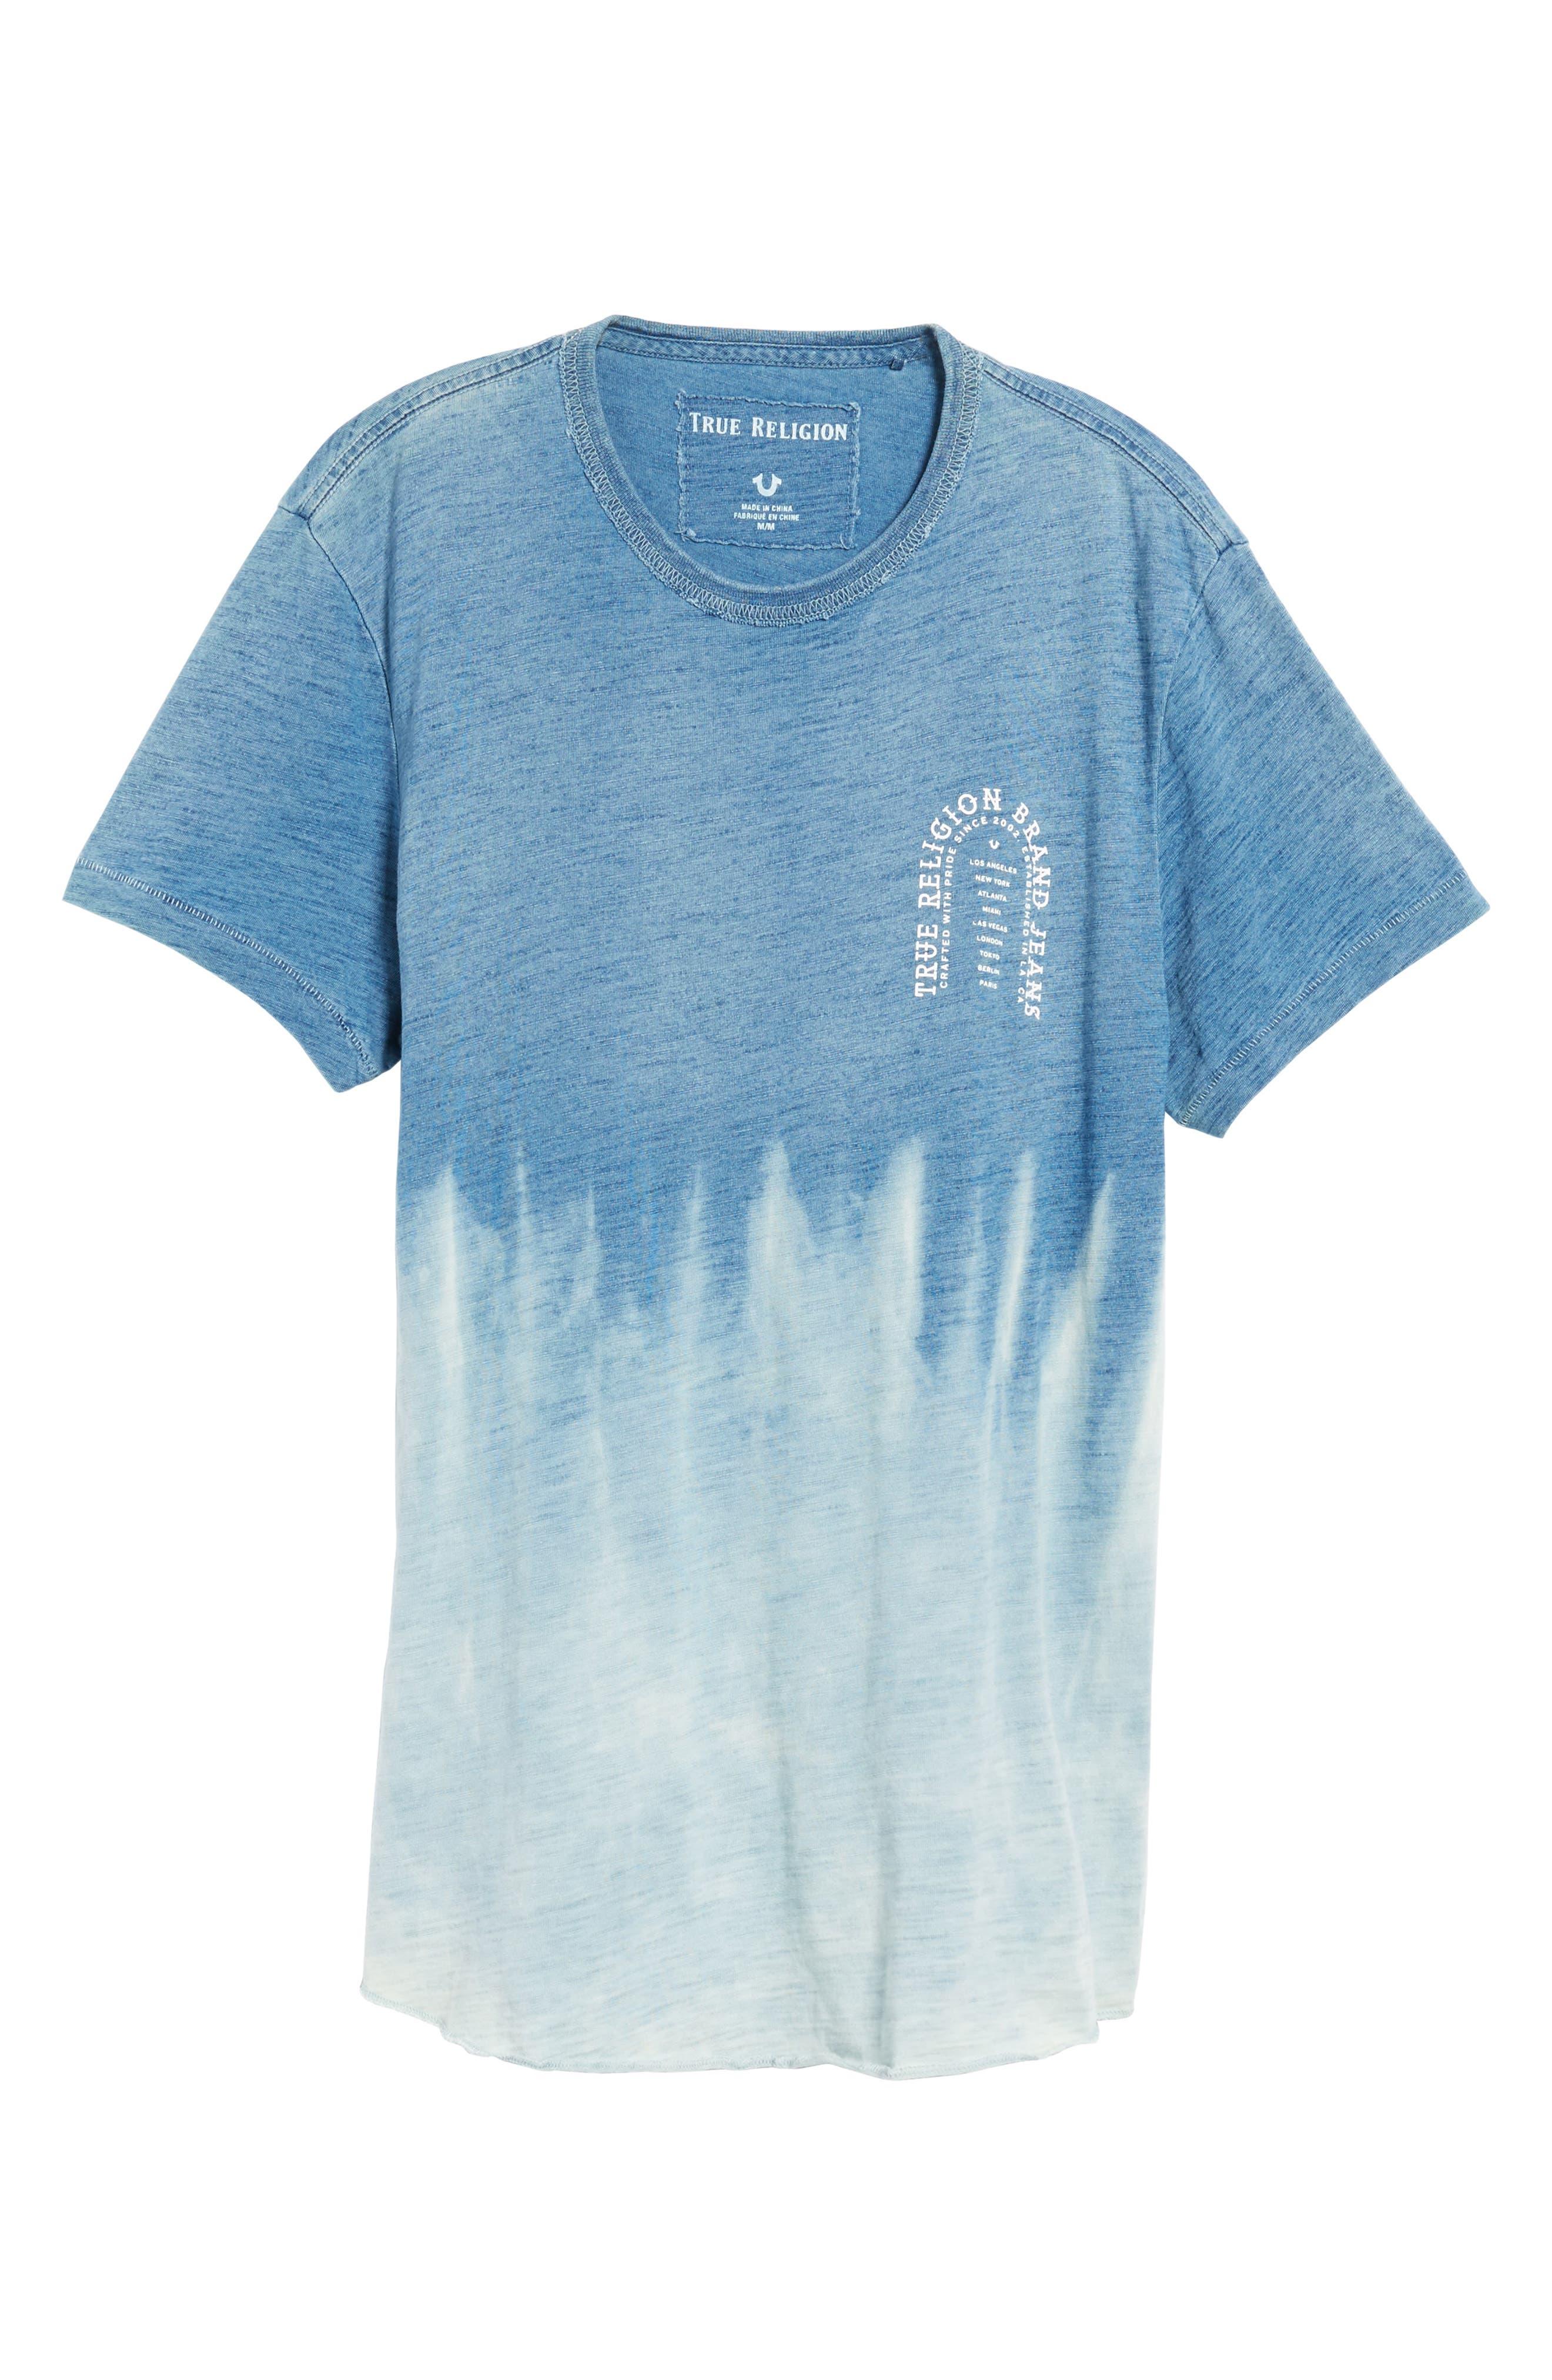 Arch T-Shirt,                             Alternate thumbnail 6, color,